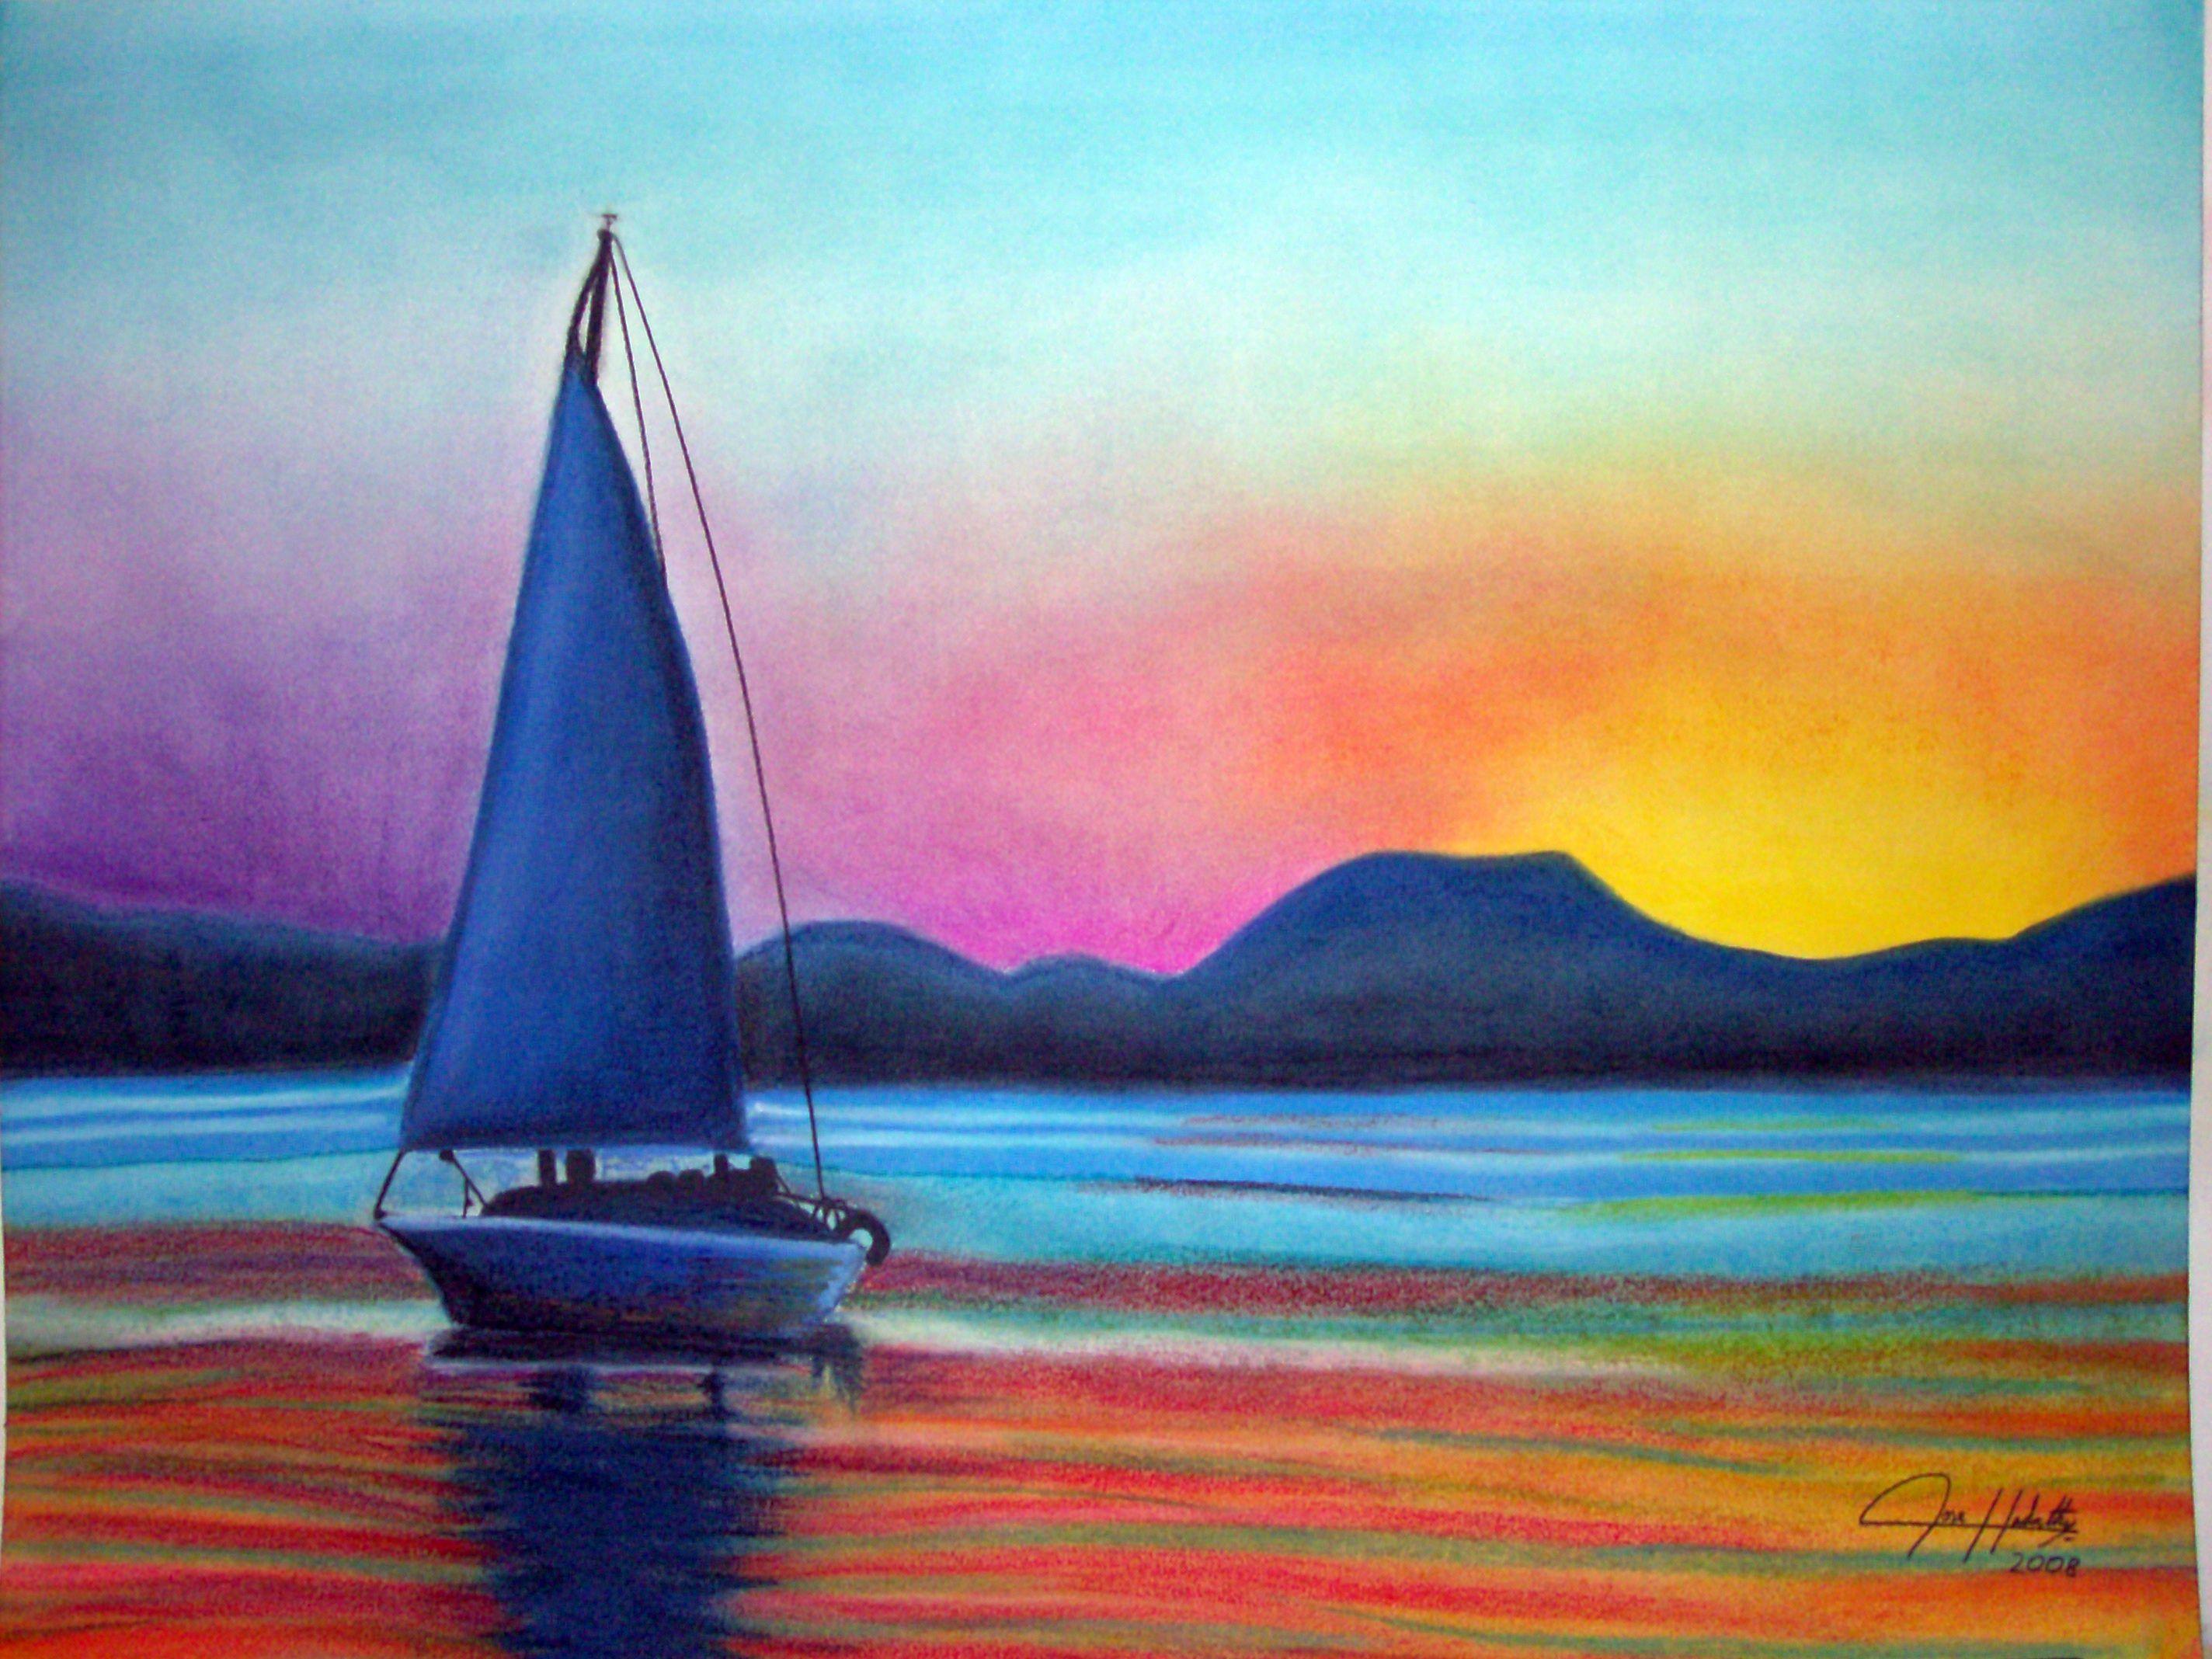 2848x2136 Sailboat Sunset Teen Pastel About Sunset, Sailboat, Drawing